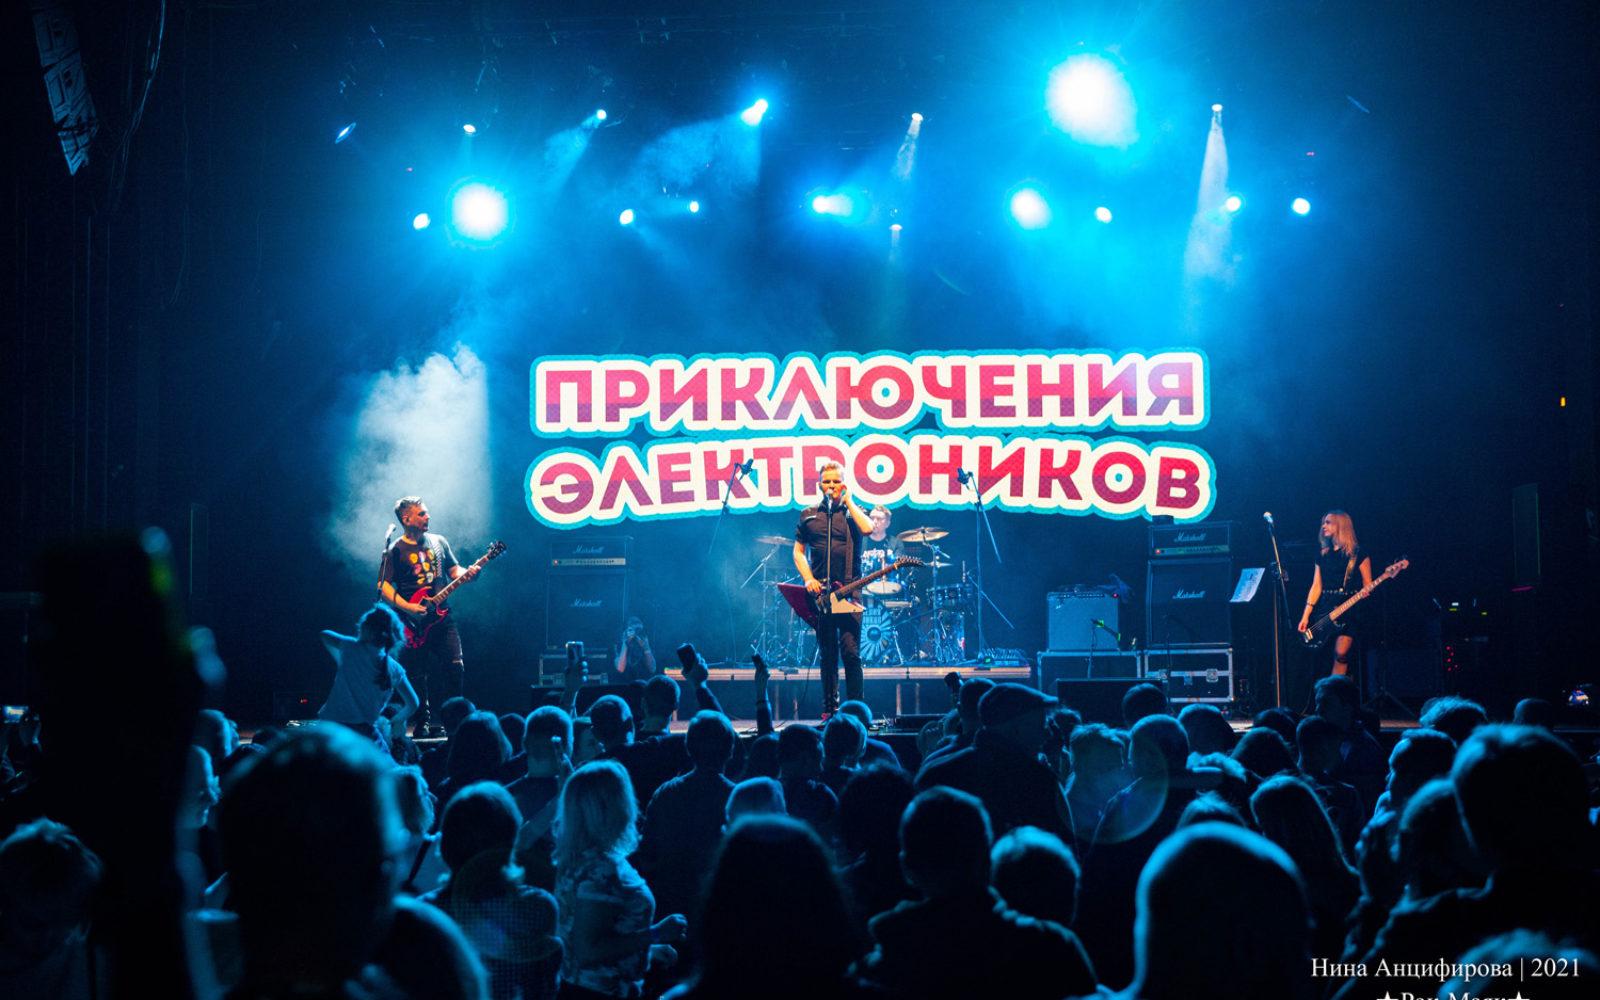 pr_electronikov (91 of 109)